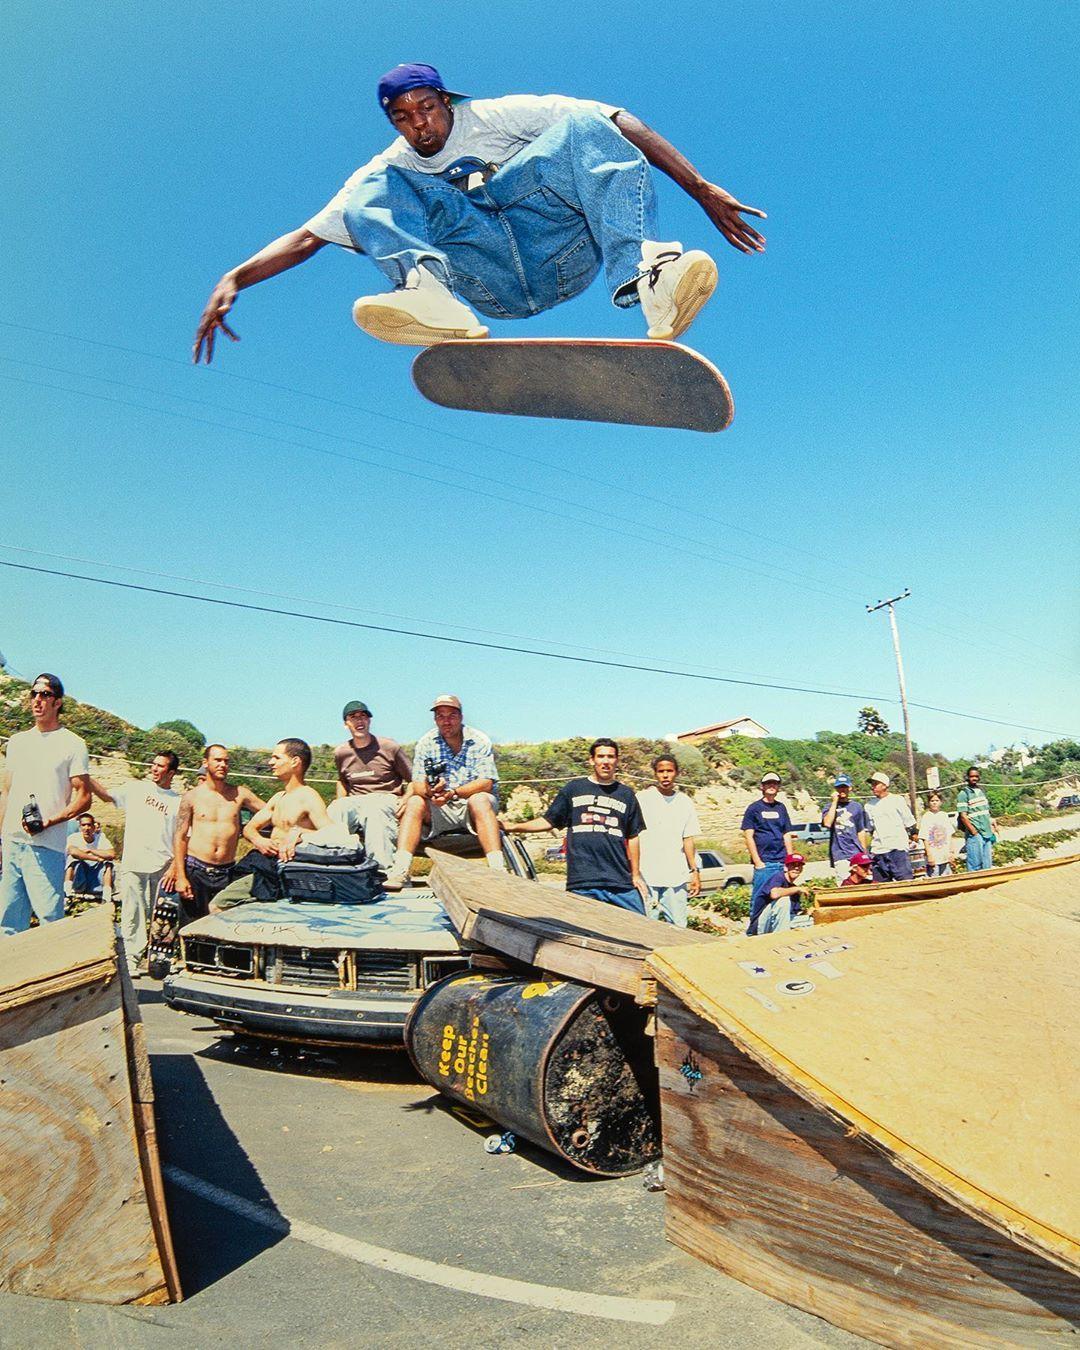 Pin By Logan T C On Skate In 2020 Skateboard Pictures Skateboard Skate